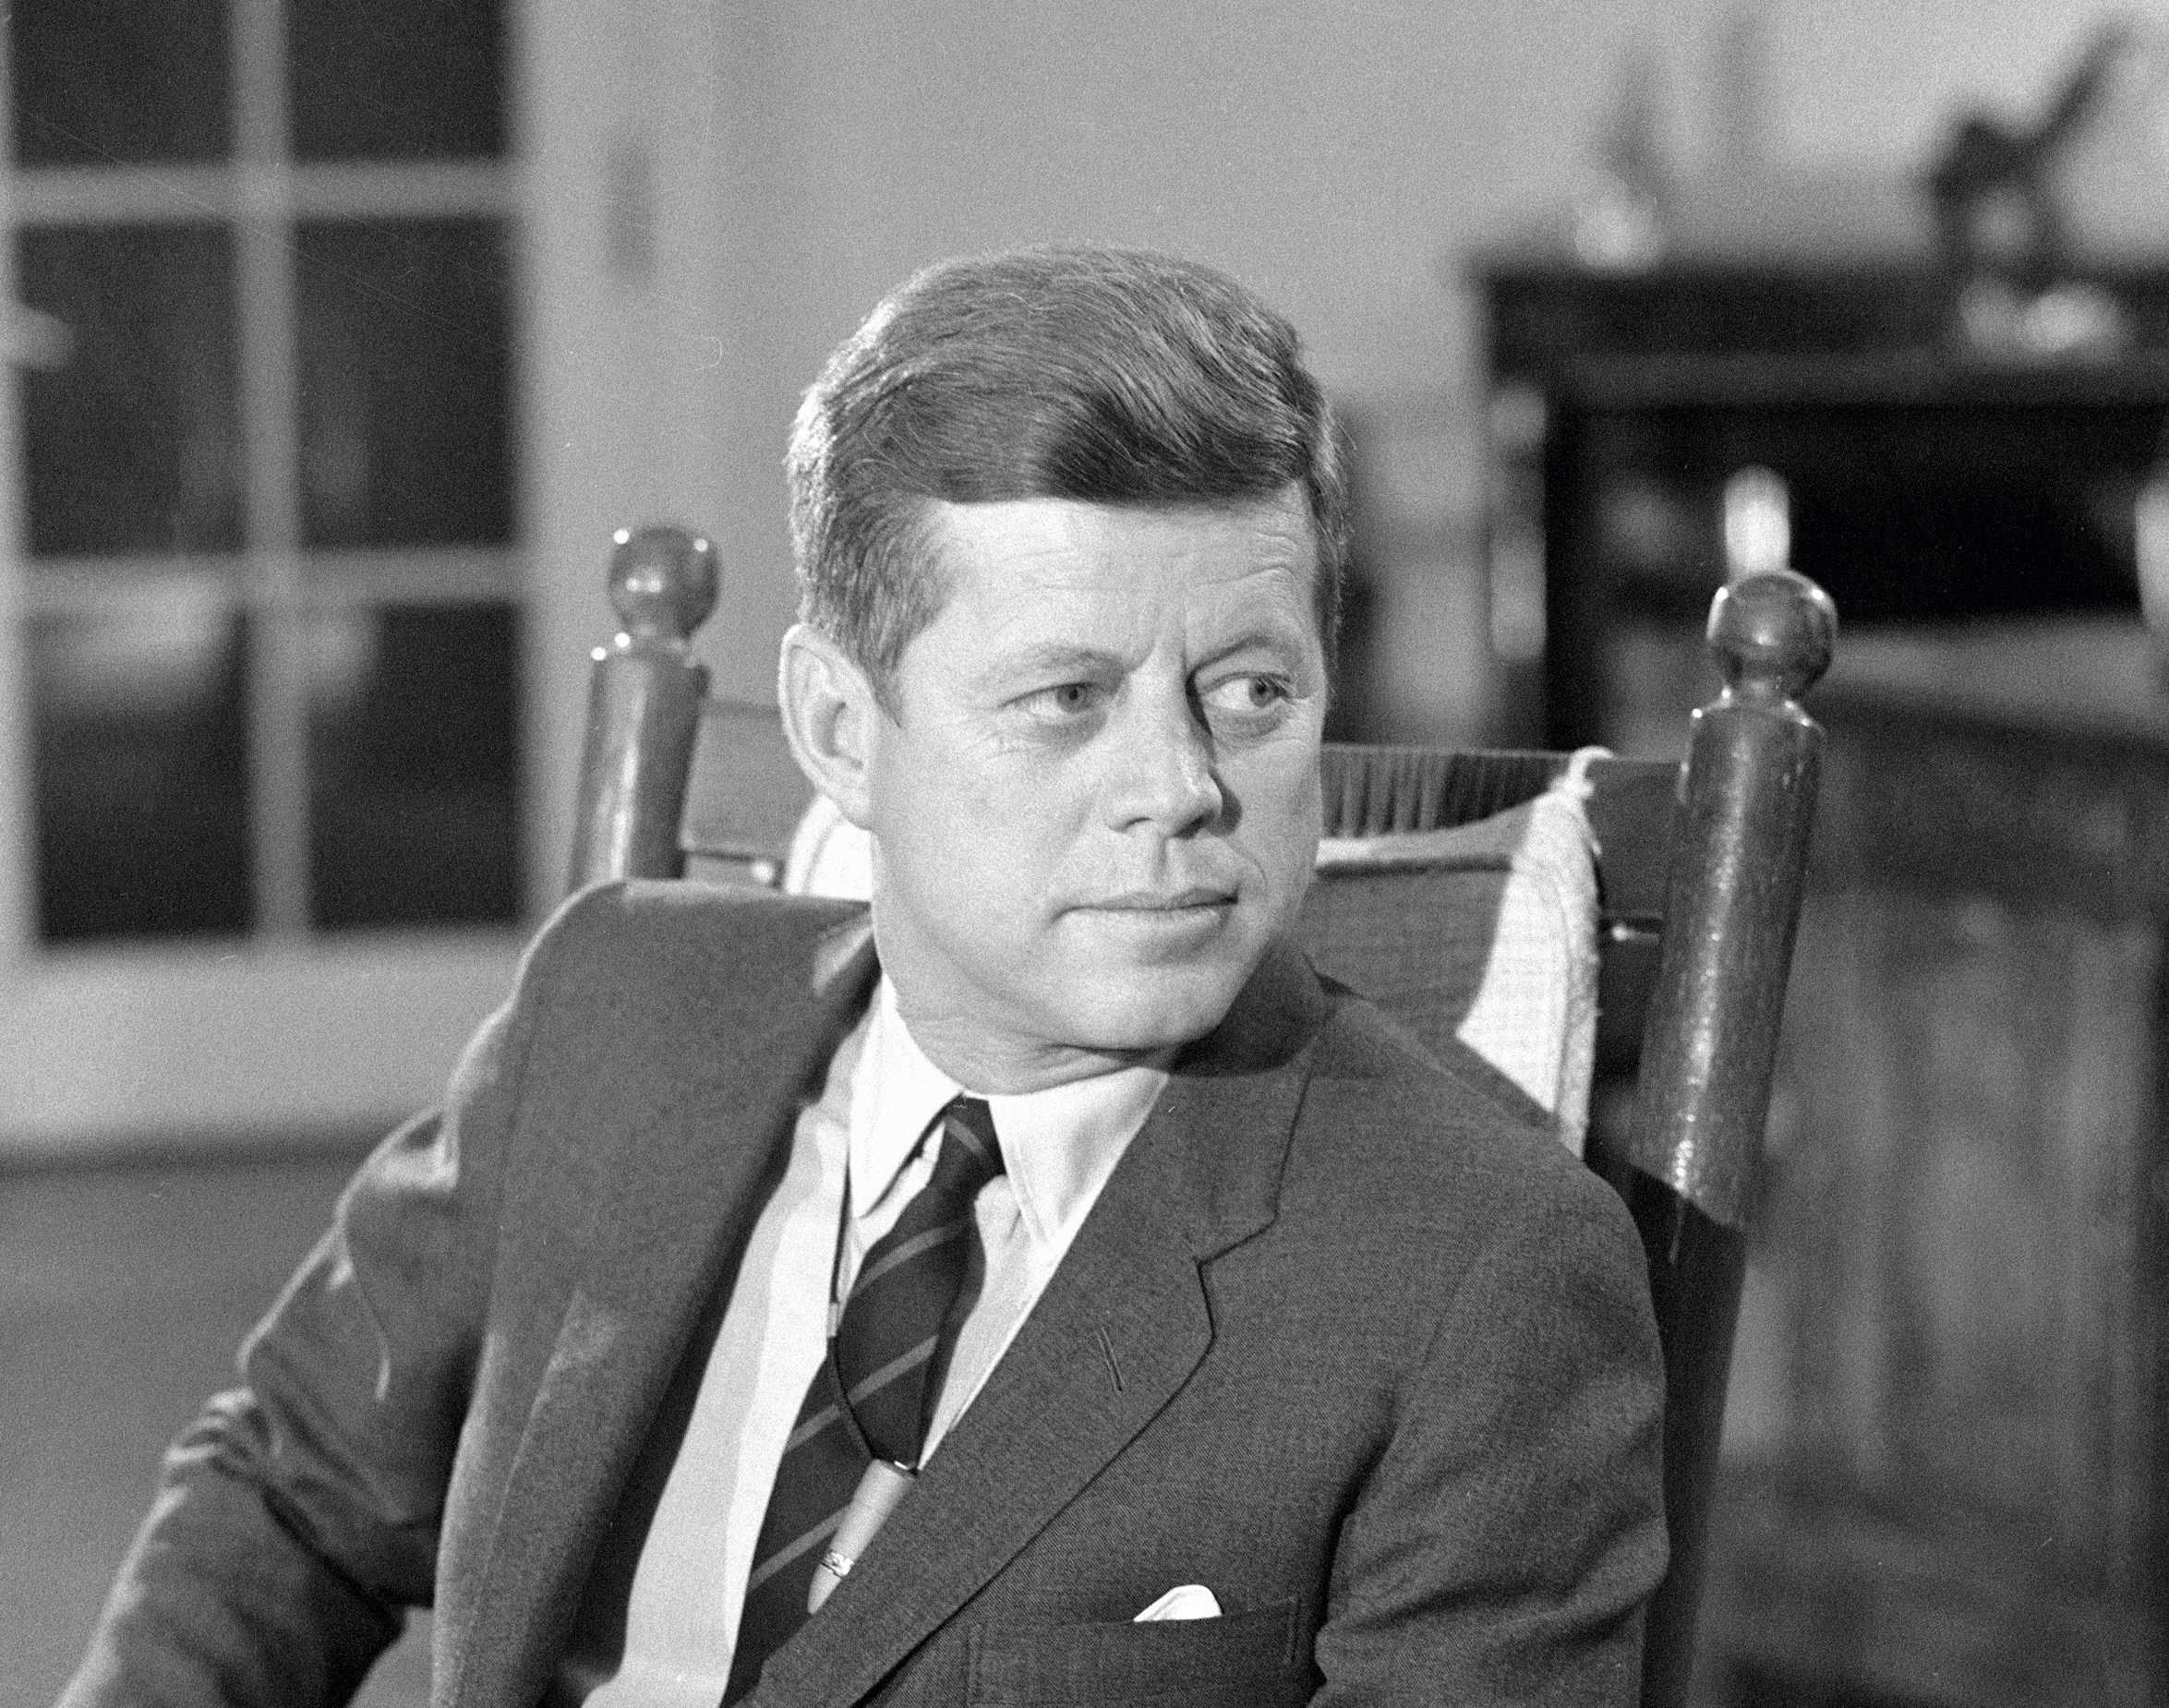 Photo of John F Kennedy